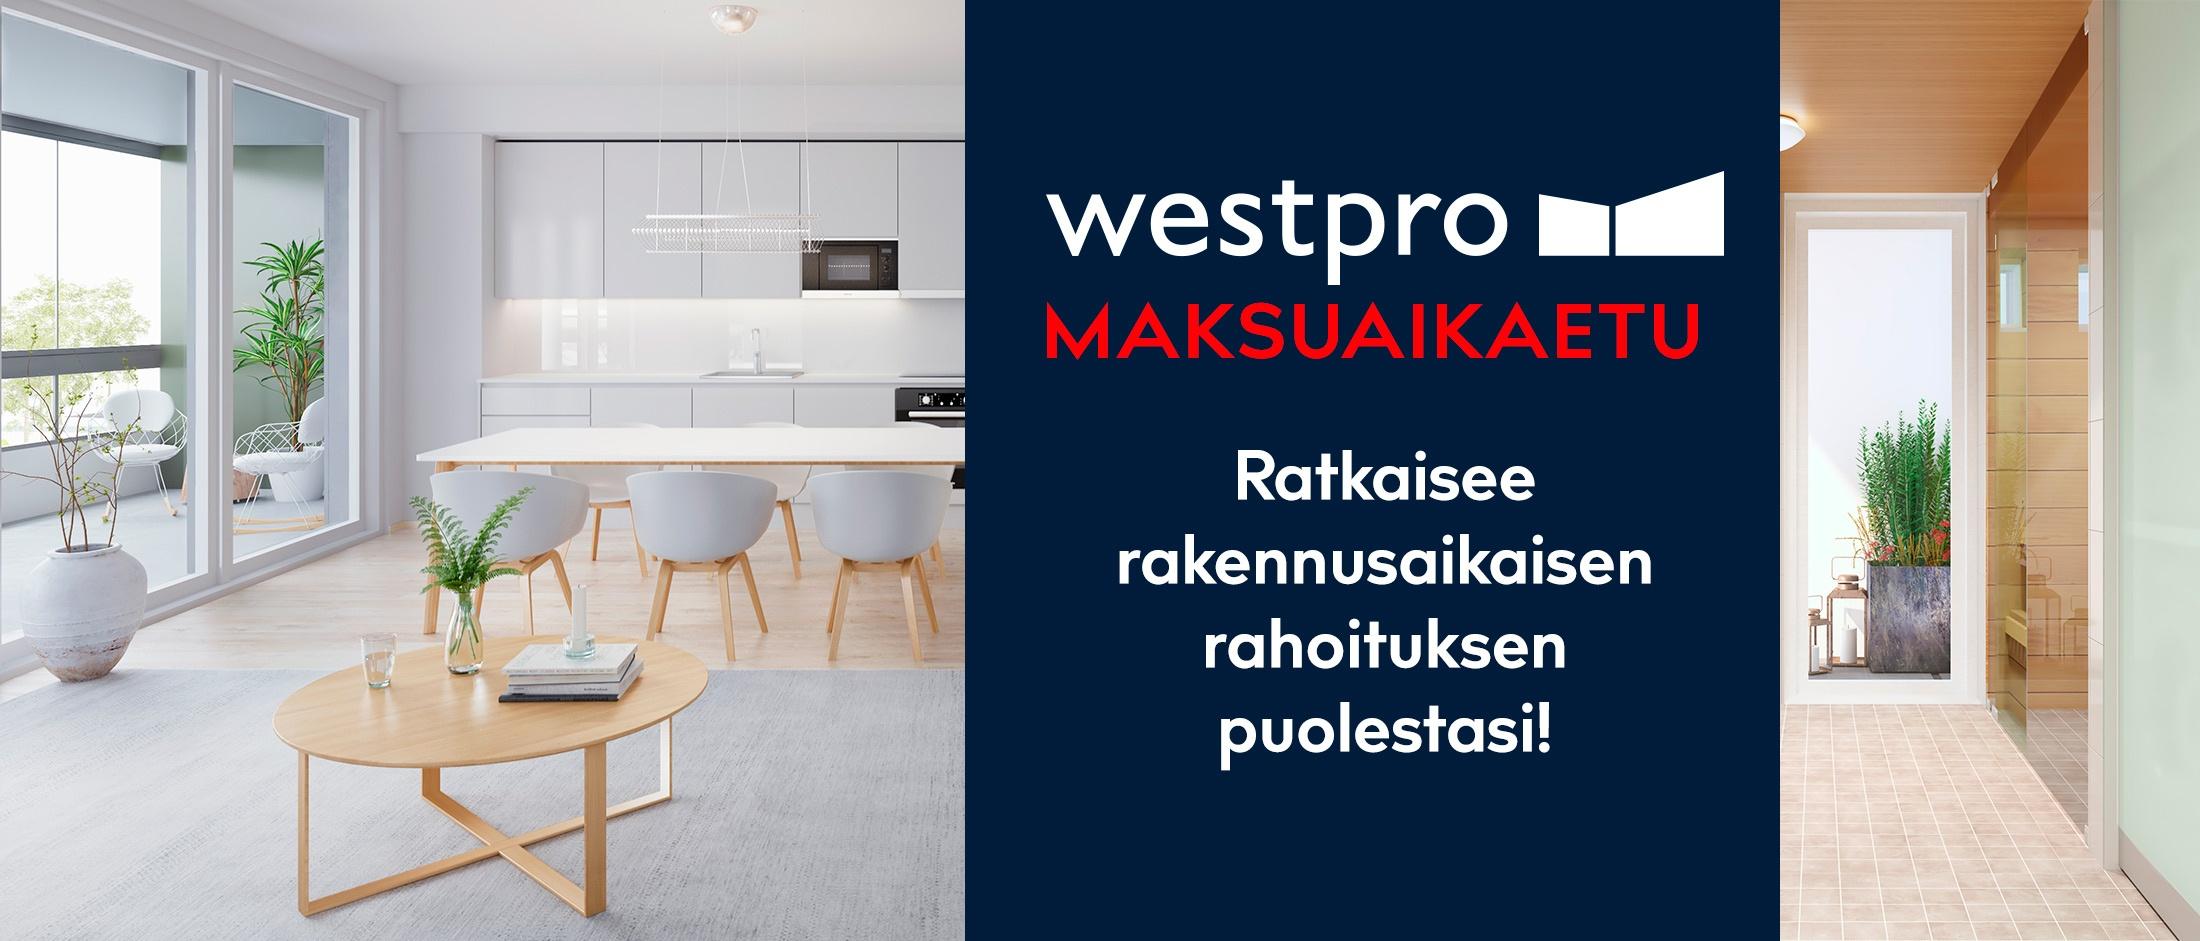 westpro-maksuaikaetu